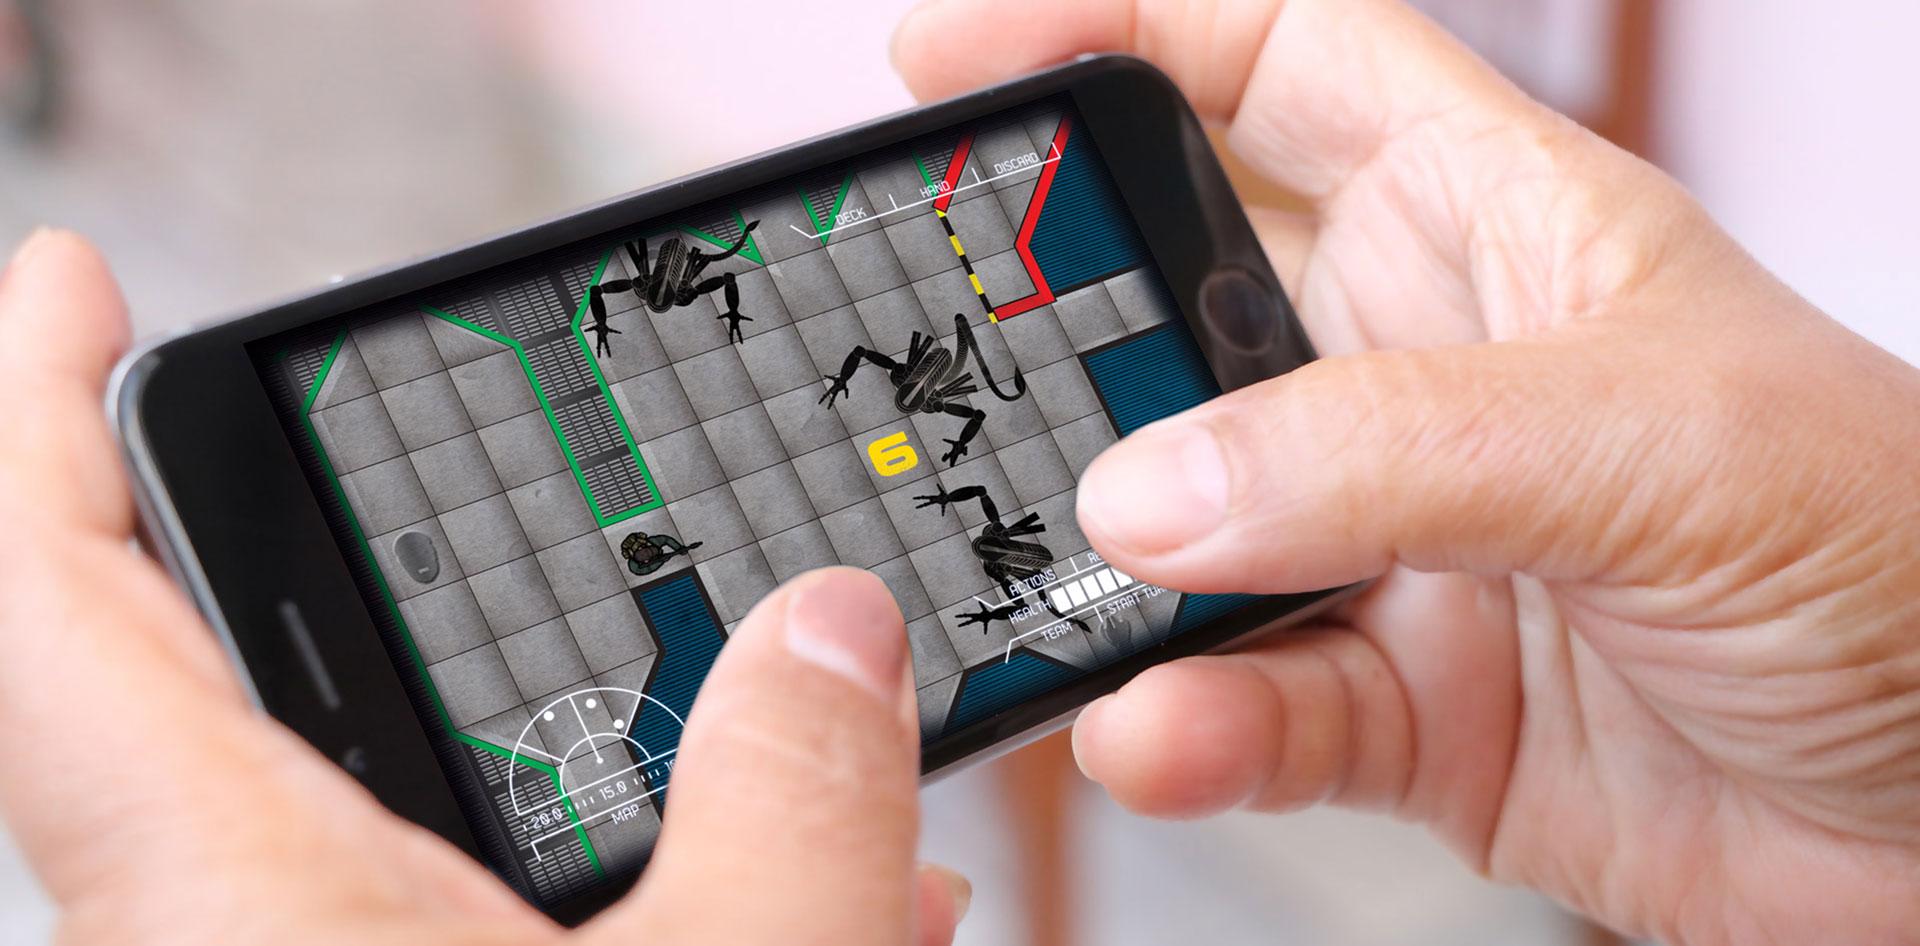 aliens-labyrinth-mobile-game-07.jpg